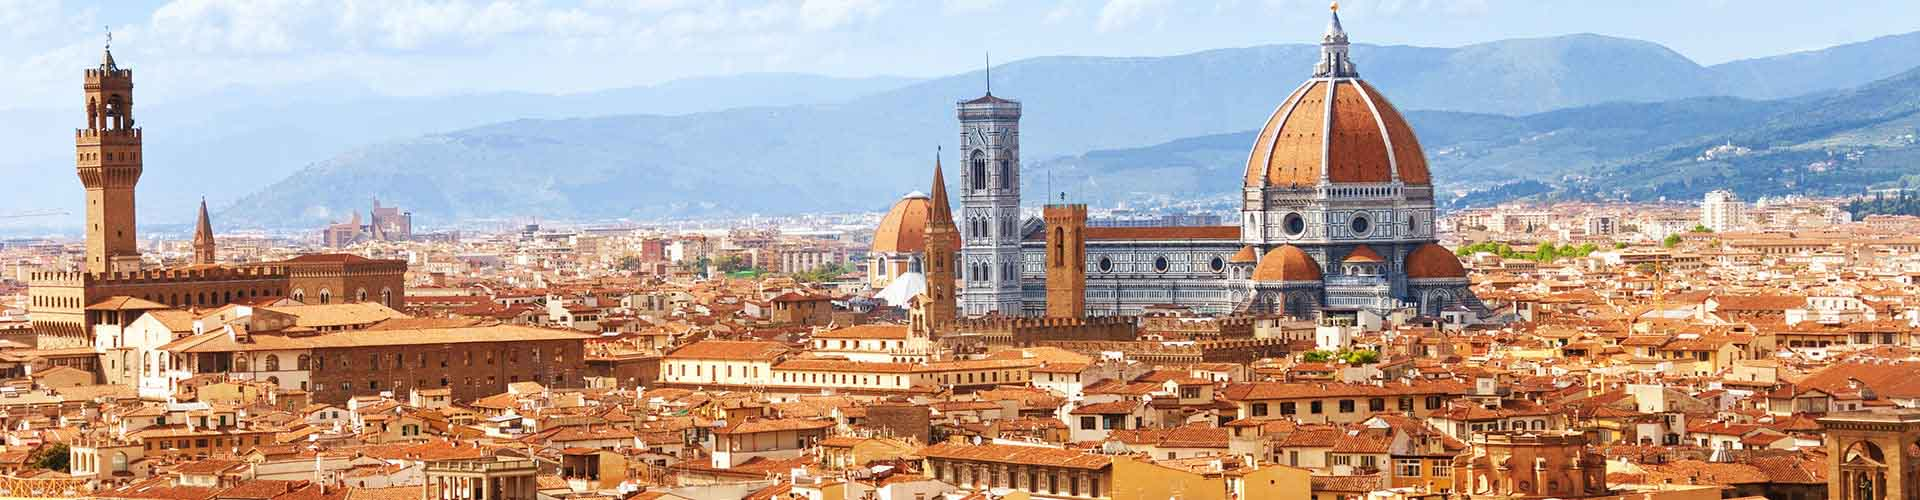 Florencia - Apartamentos en Florencia. Mapas de Florencia, Fotos y comentarios de cada Apartamento en Florencia.